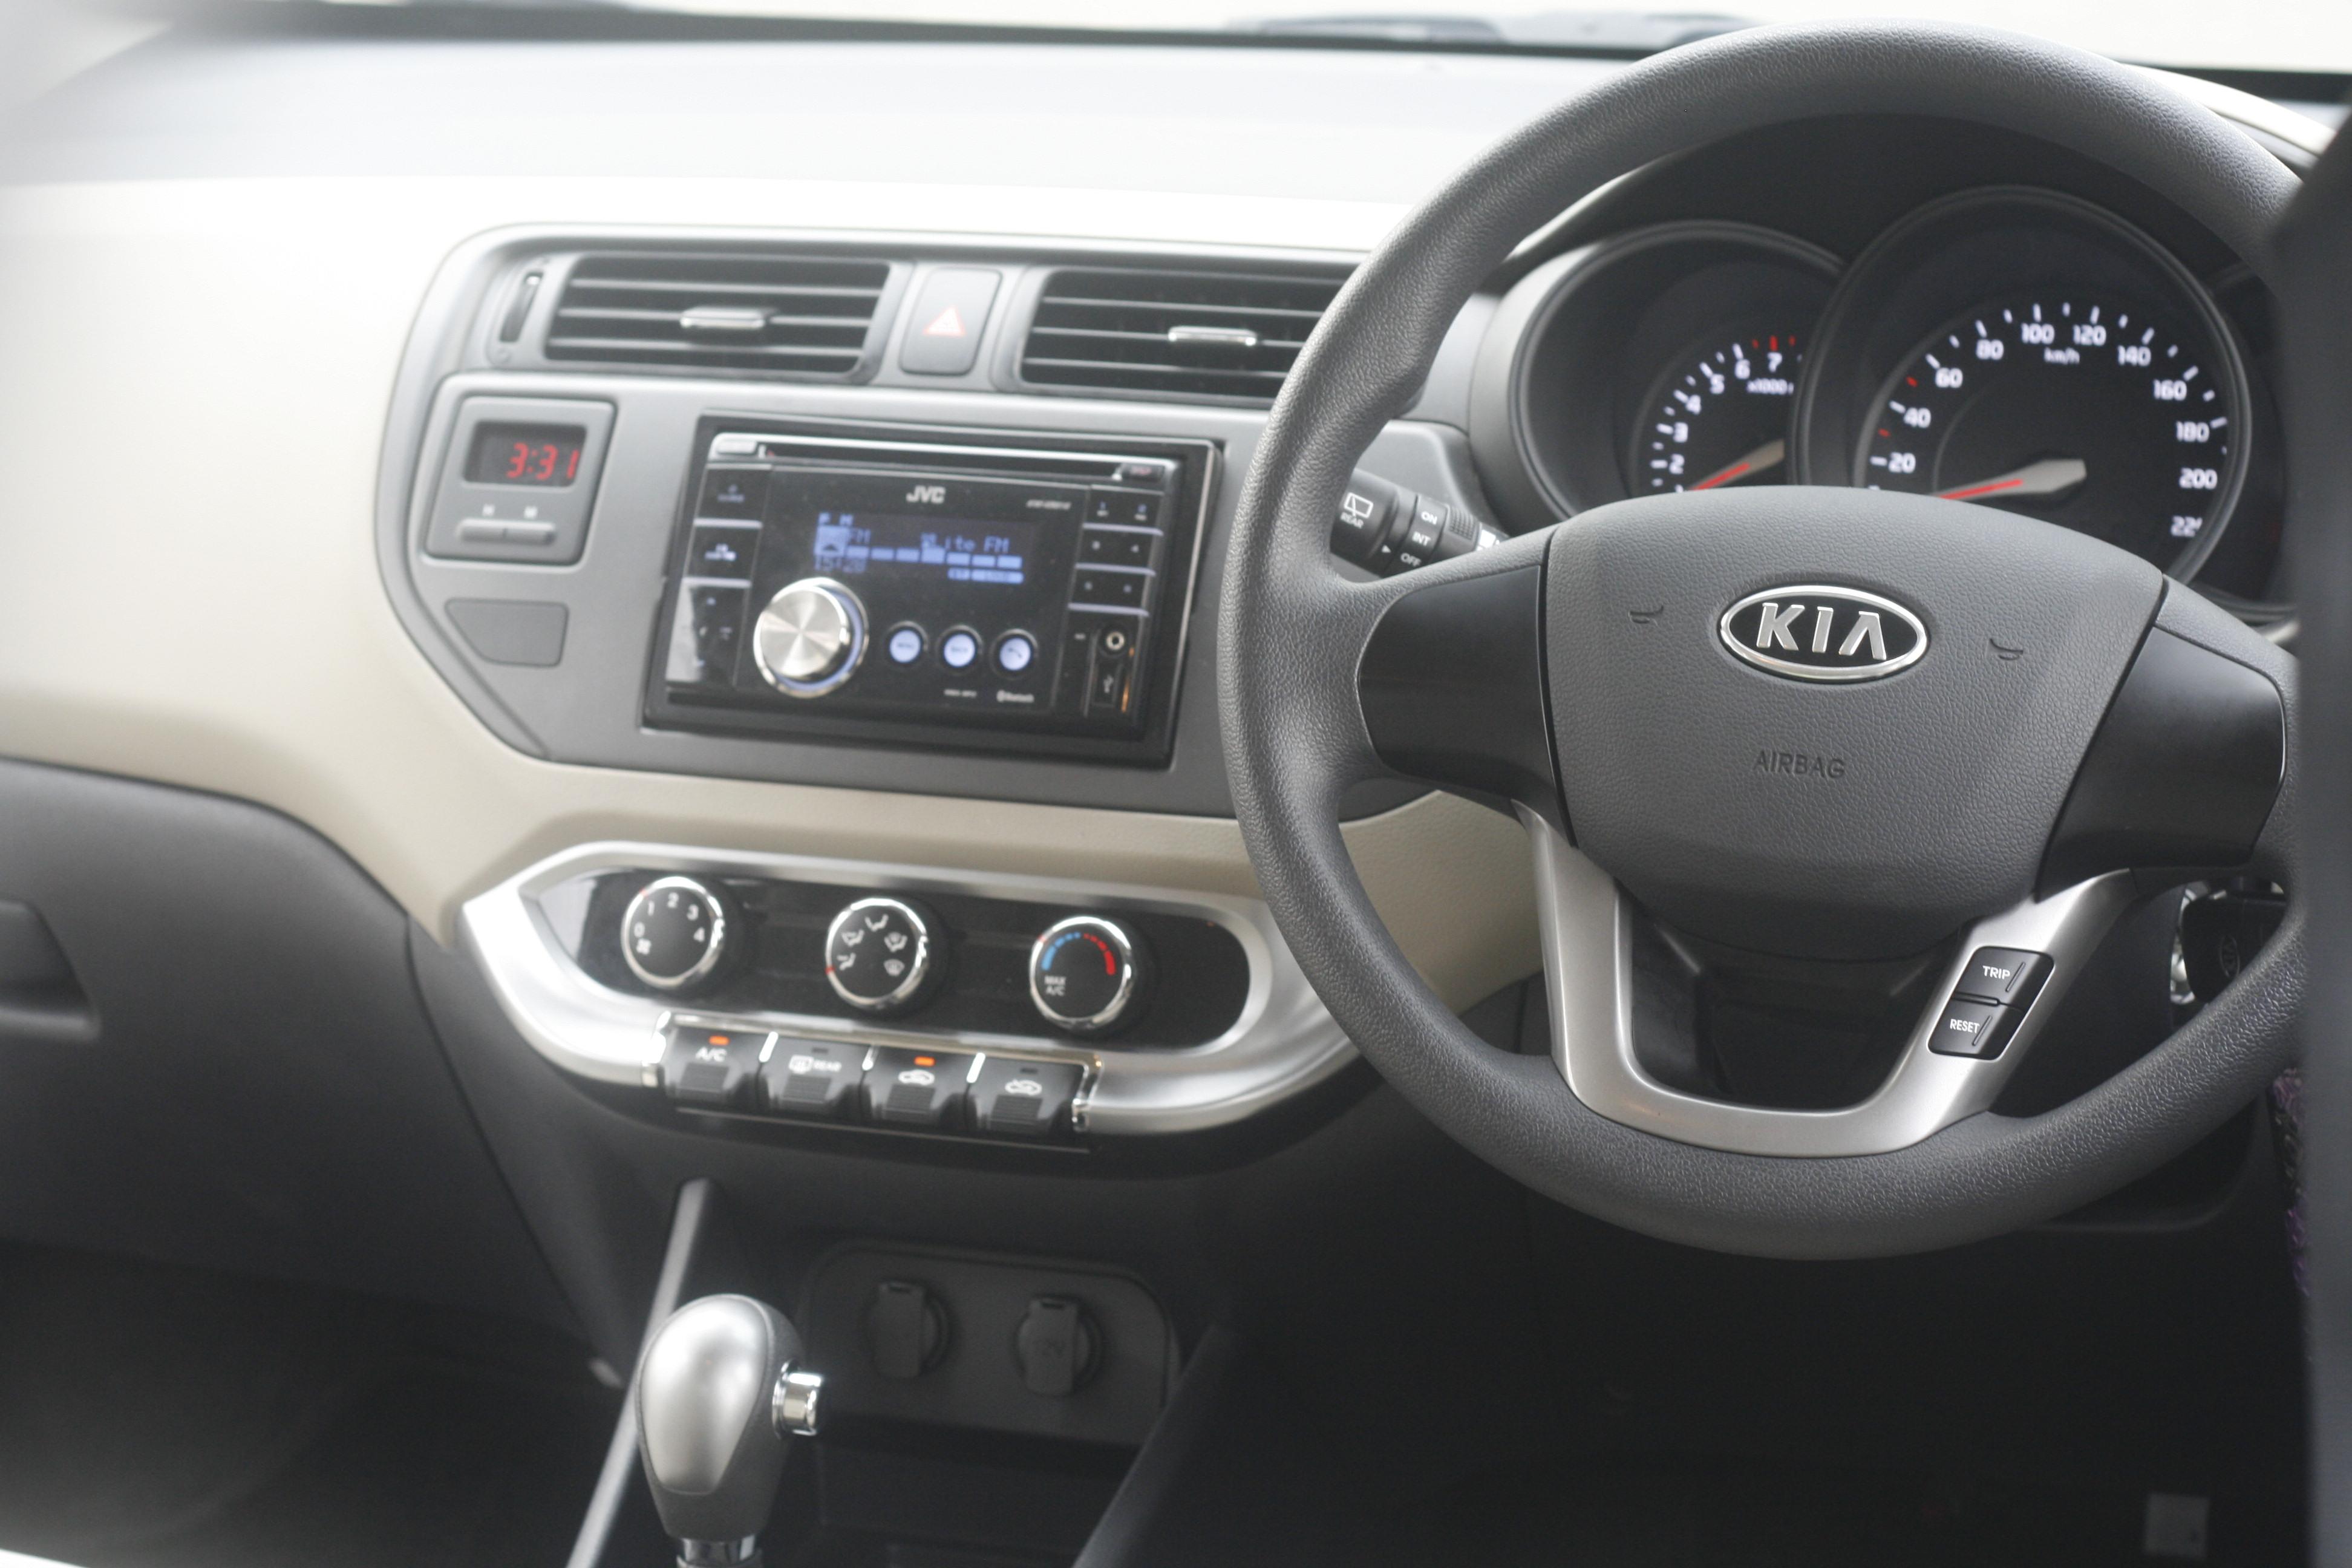 test drive grand new veloz velg yaris trd all kia rio 1 4 a t car build for the